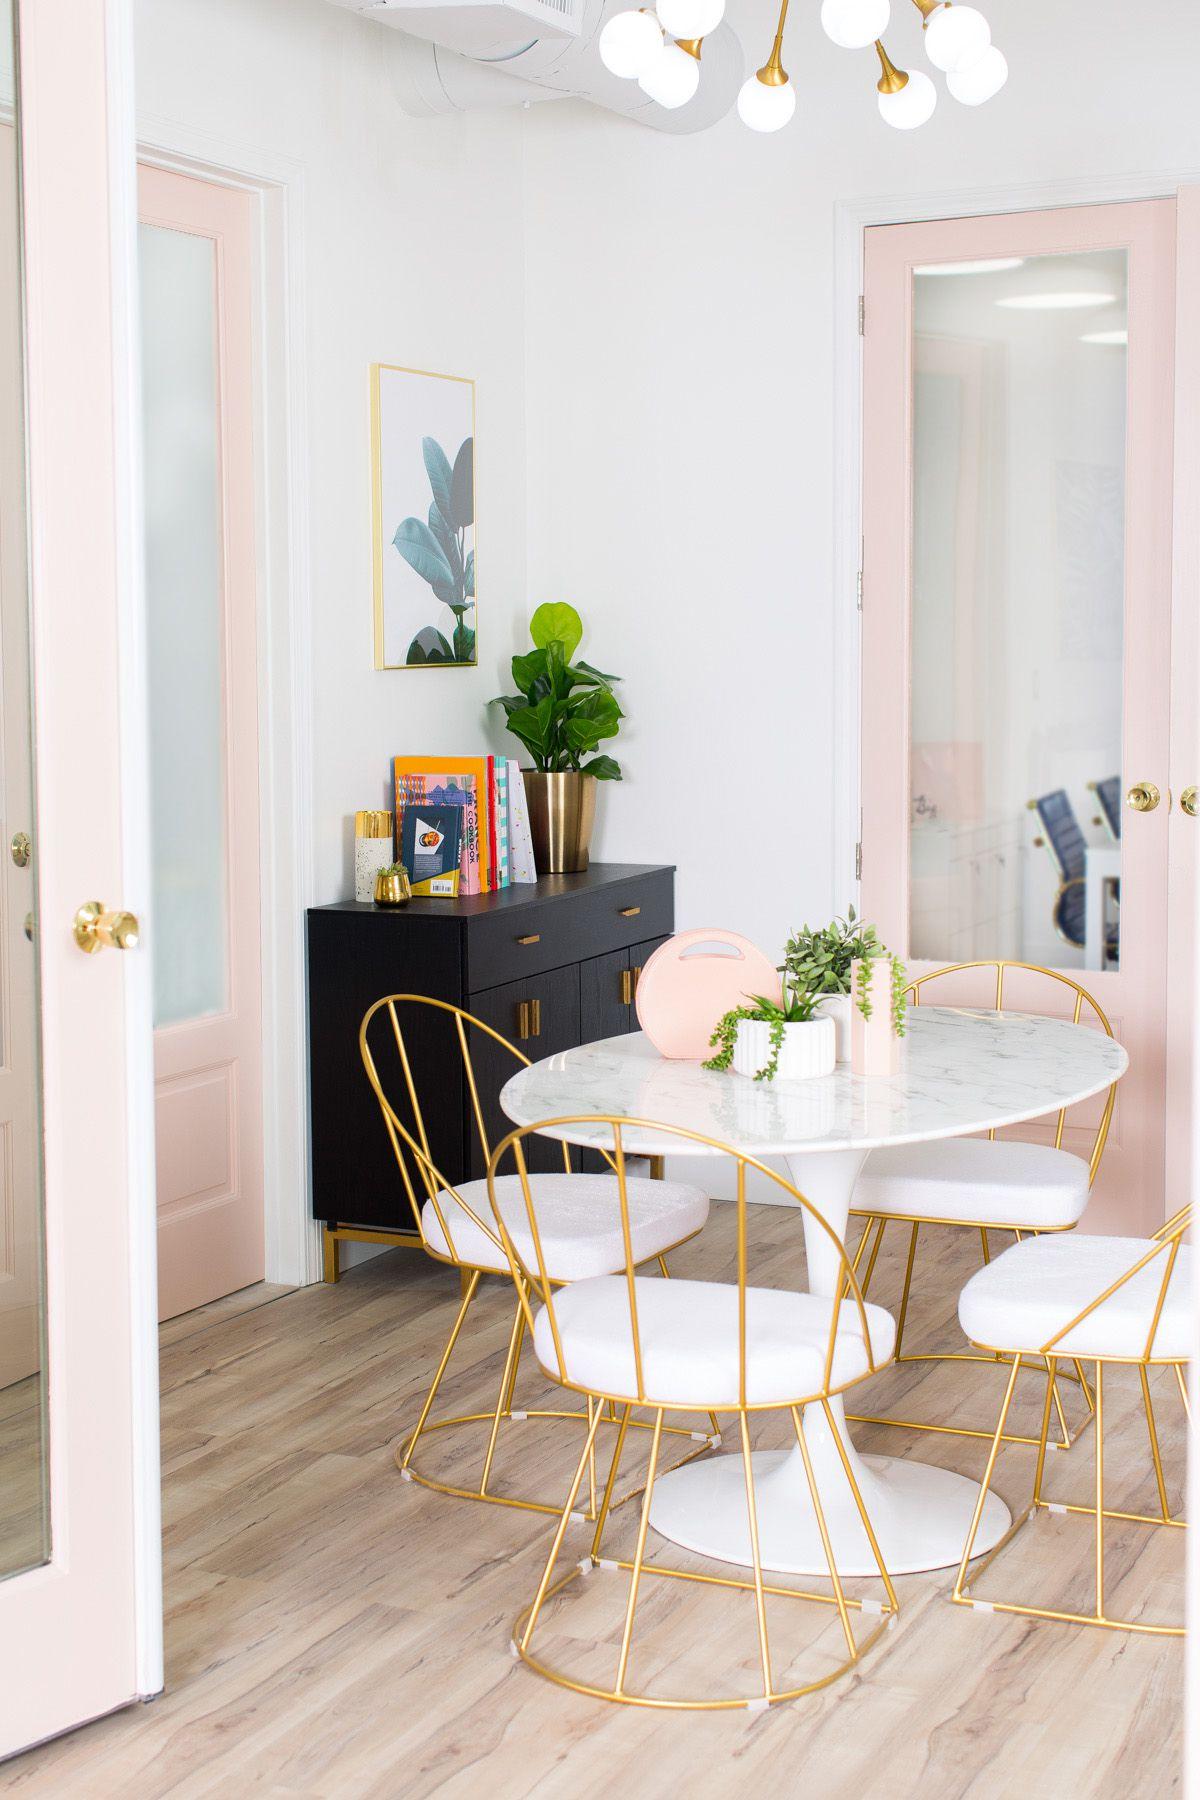 small house interior design image SNPJRKT